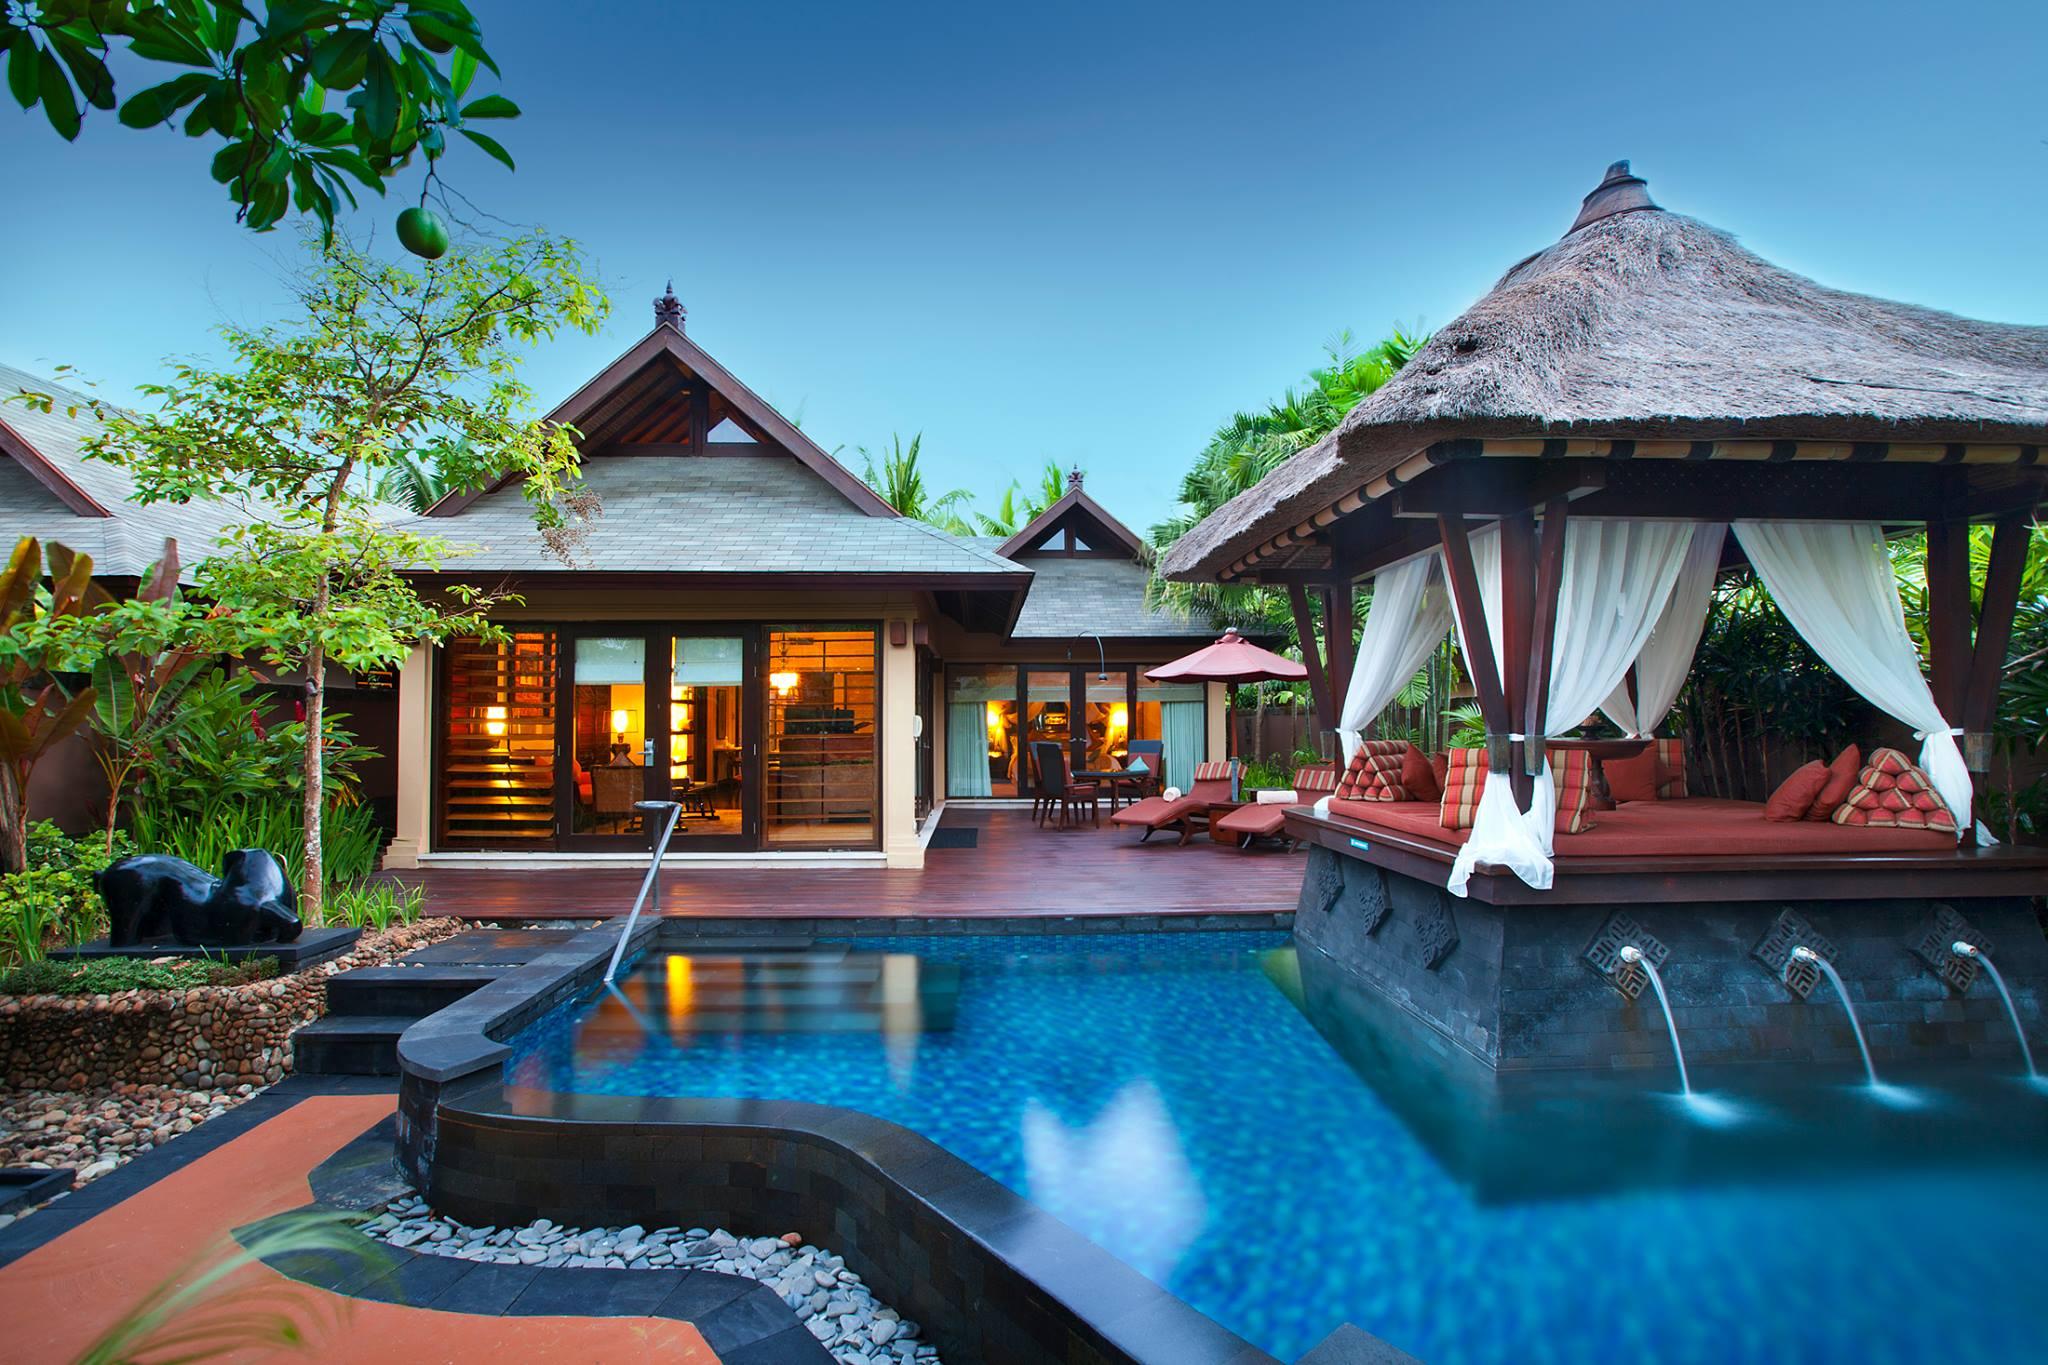 Photo of تور بالی اندونزی پاییز ۹۹ با ارزان ترین قیمت بازار خریداری کنید ؟ !